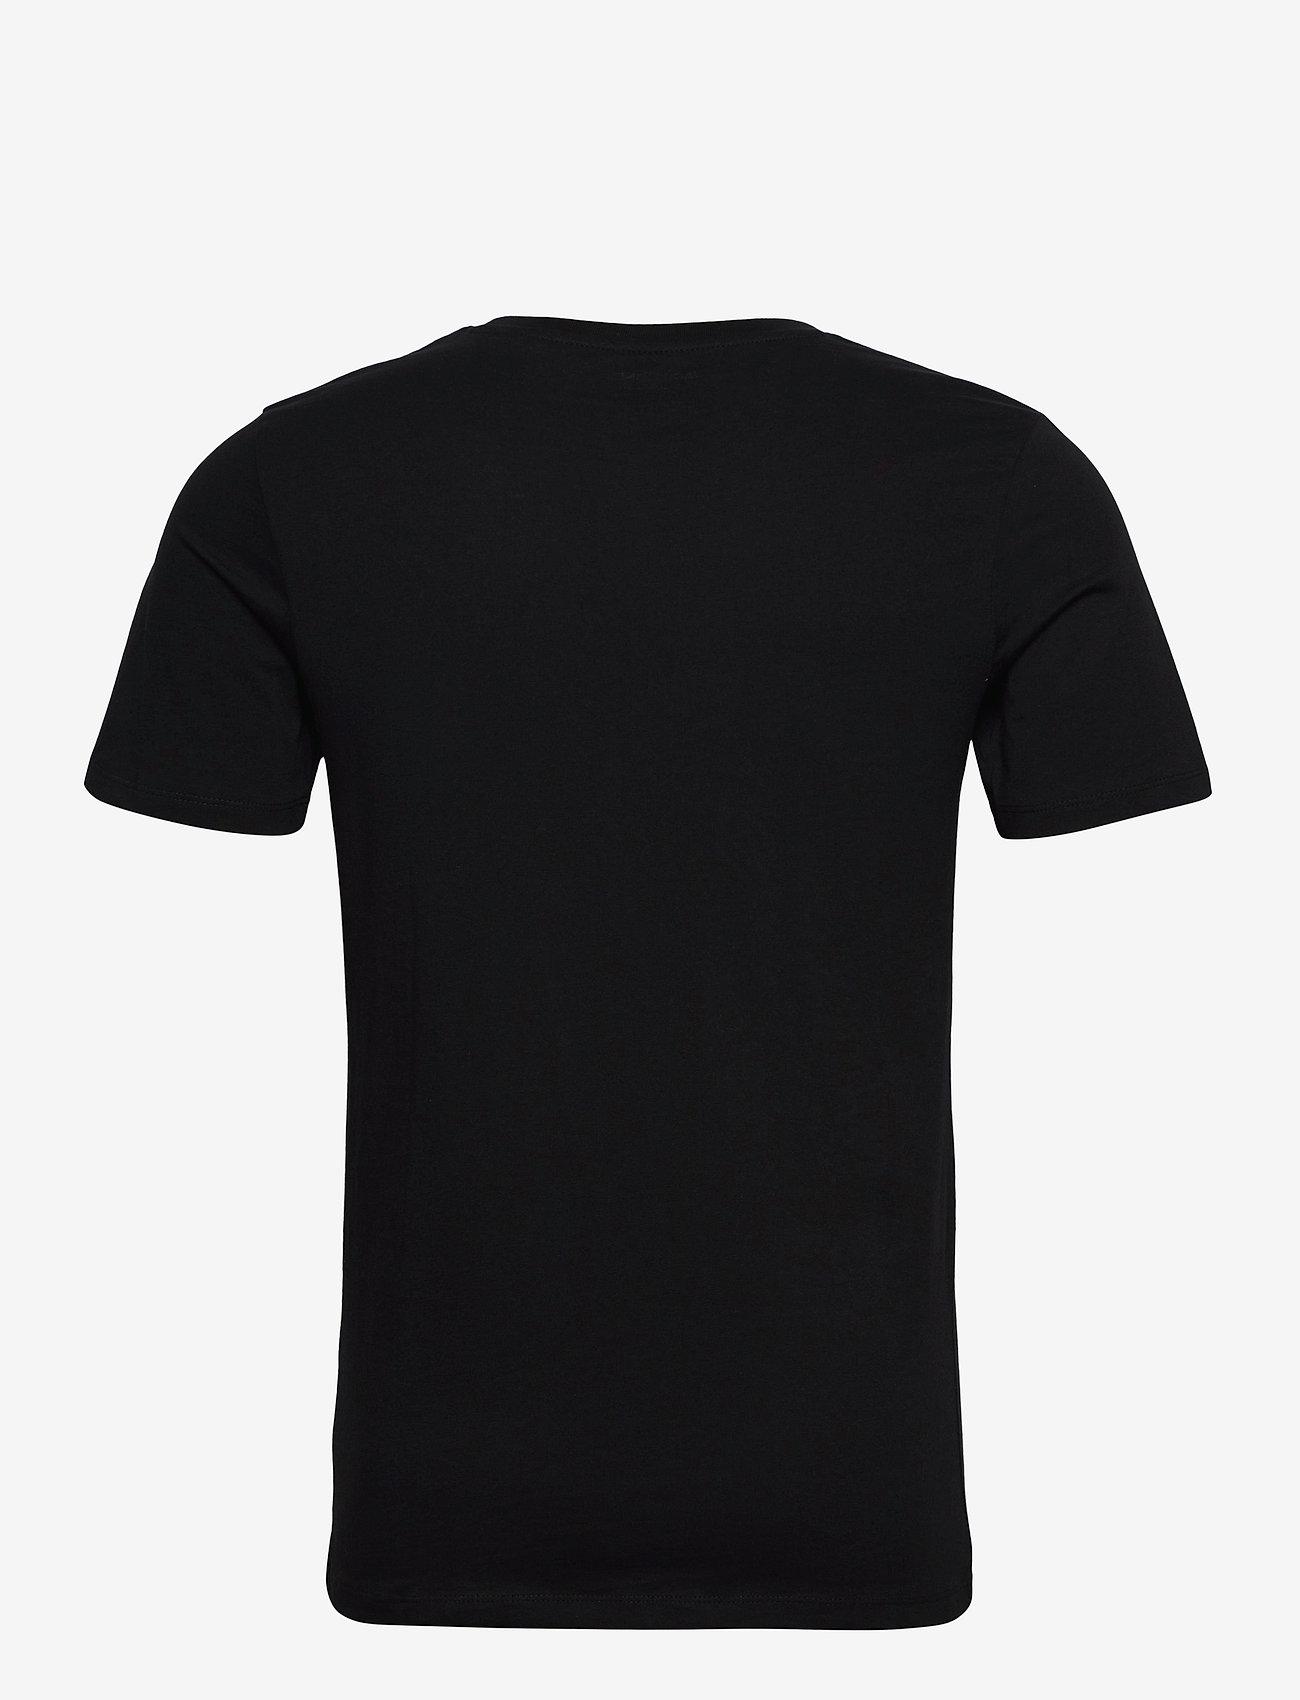 Jack & Jones - JJELOGO TEE SS O-NECK 2 COL SS21 - kortärmade t-shirts - black - 1